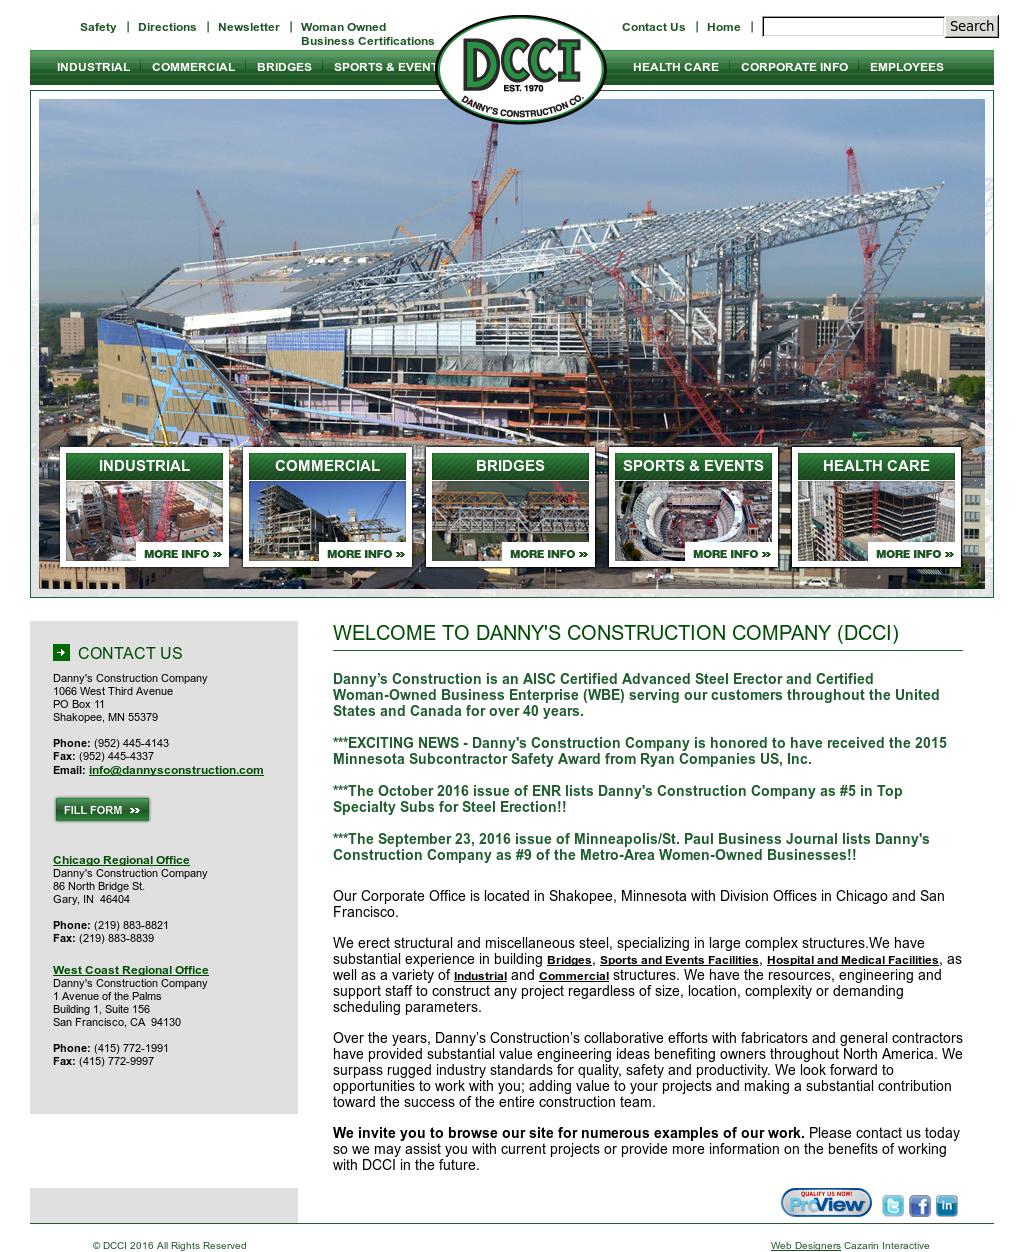 DCCI Competitors, Revenue and Employees - Owler Company Profile